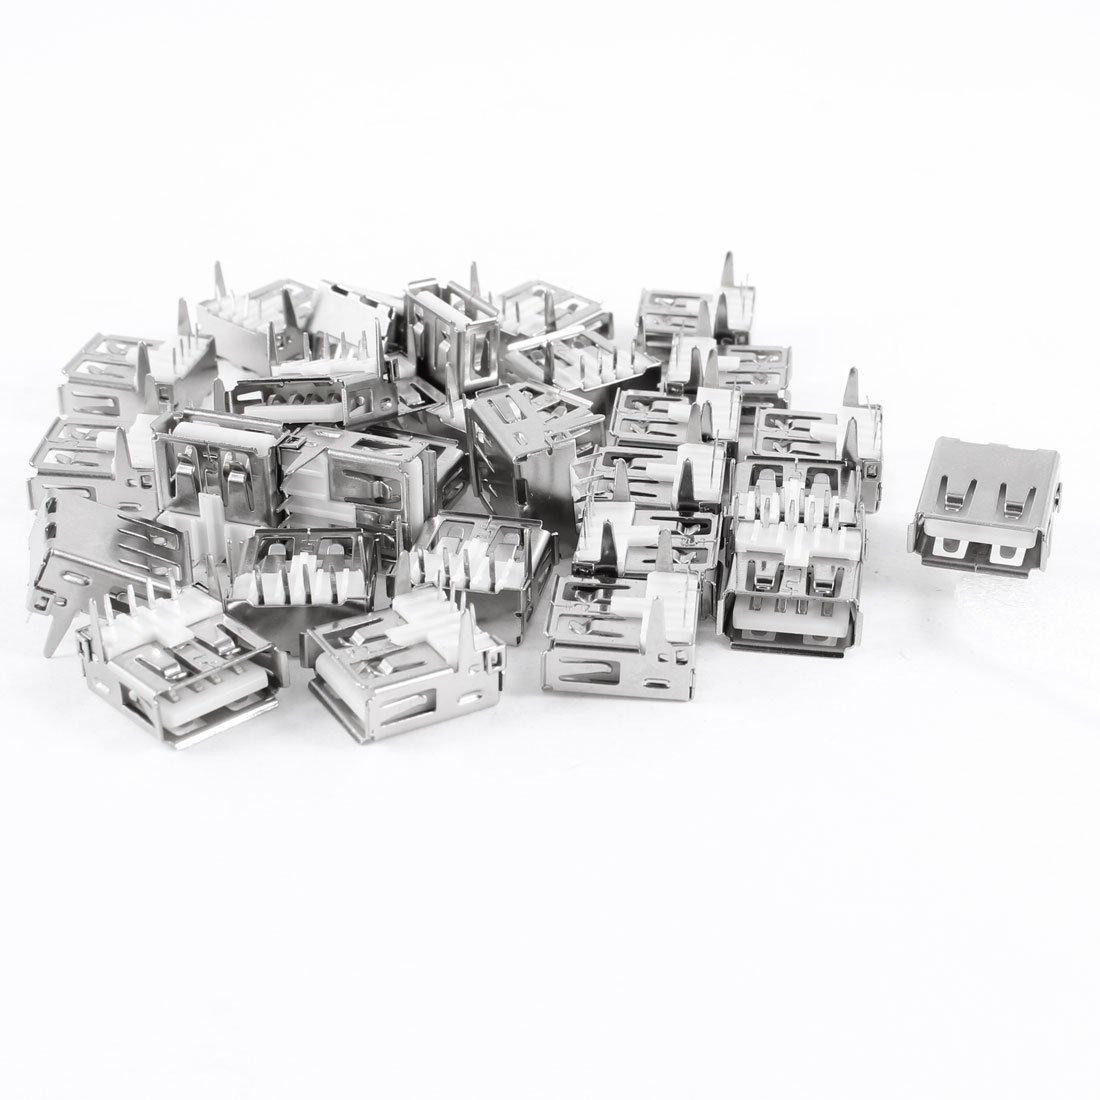 30 Pcs USB Female Type A Port 4-Pin DIP 90 Degree Jack Socket Connector